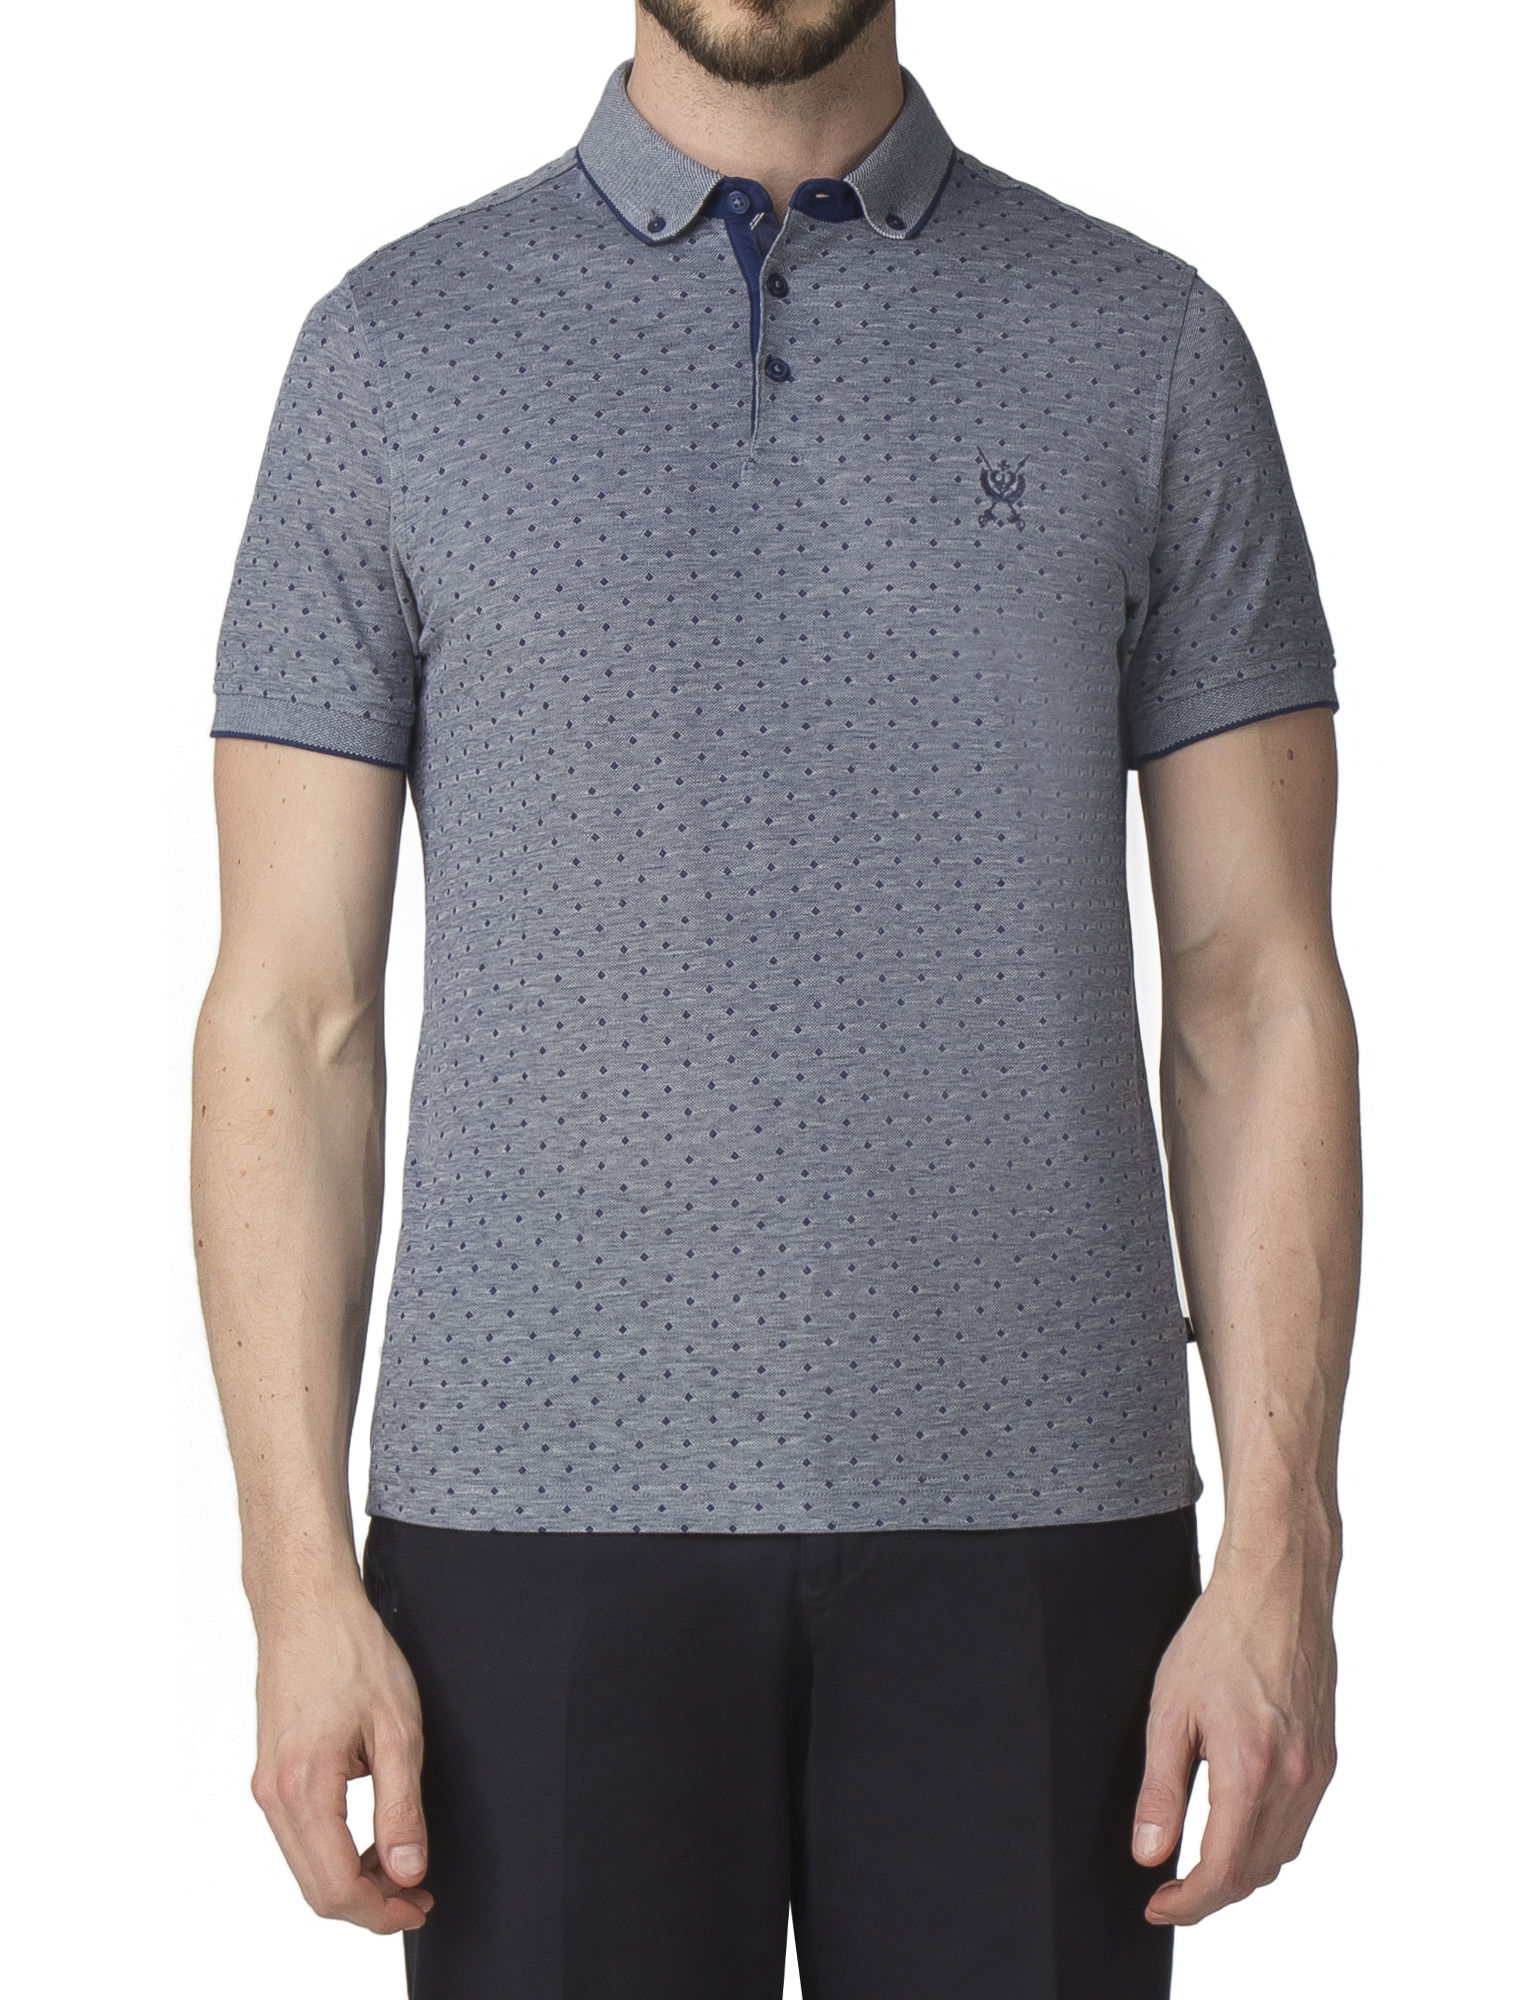 e4b01f5f91 Men's Blue Diamond Jacquard Polo Shirt   Jeff Banks